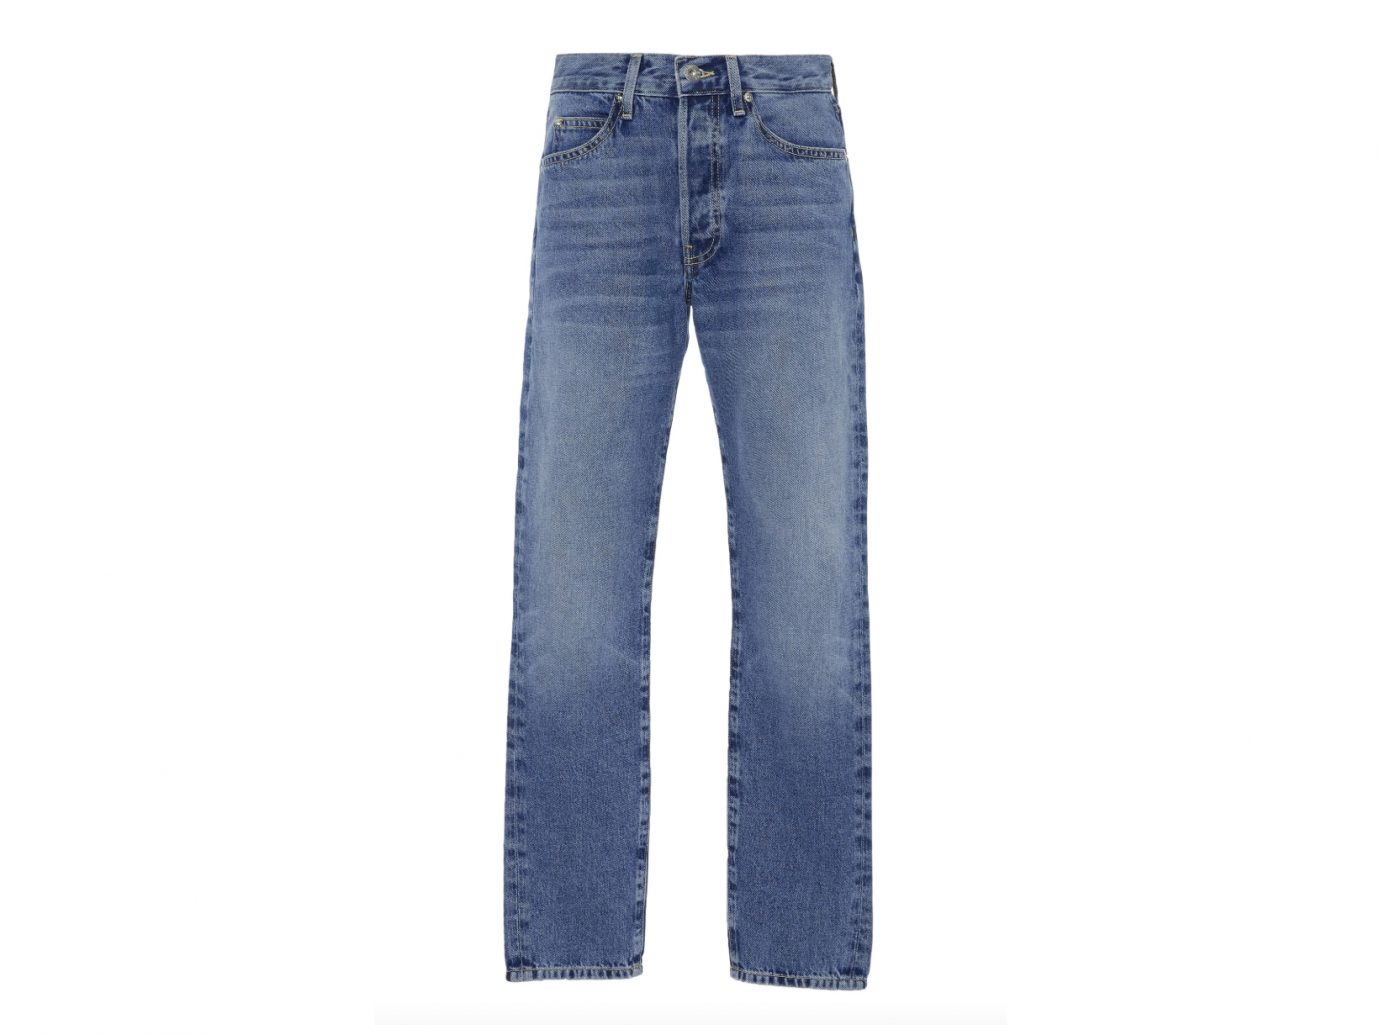 Eve Denim Silver Bullet Mid-Rise Skinny Jeans